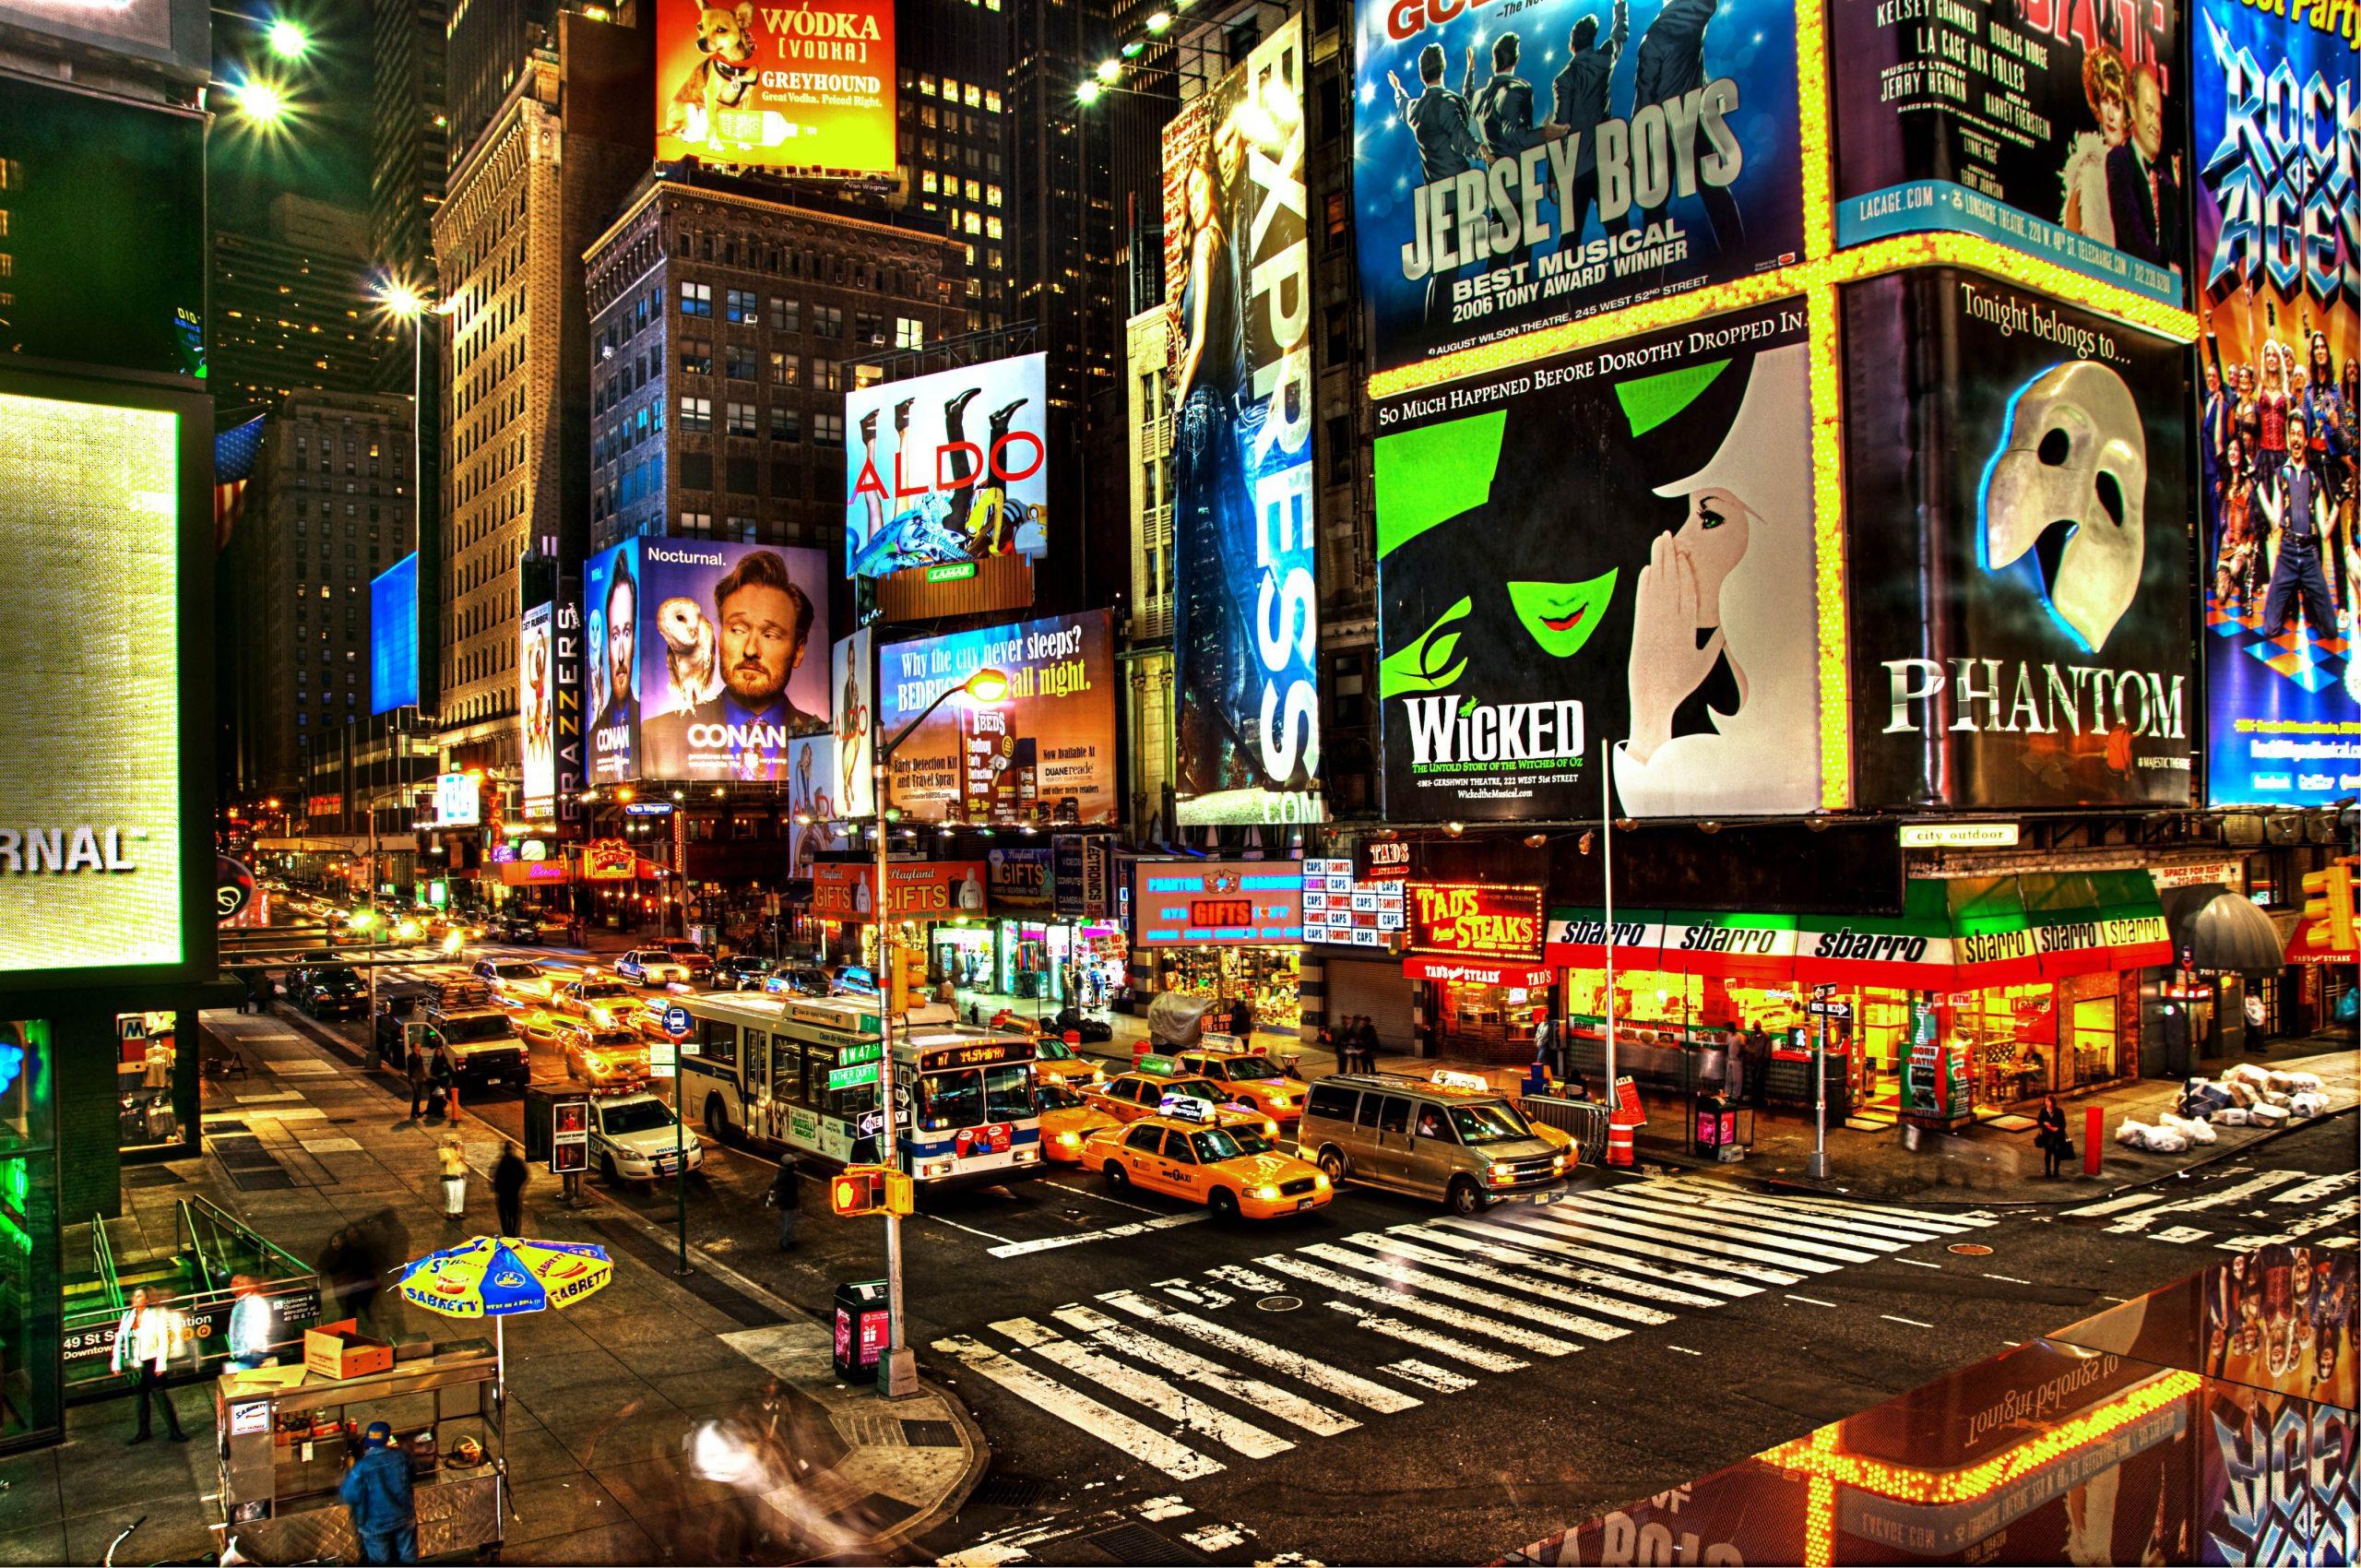 Broadway Discount Tickets